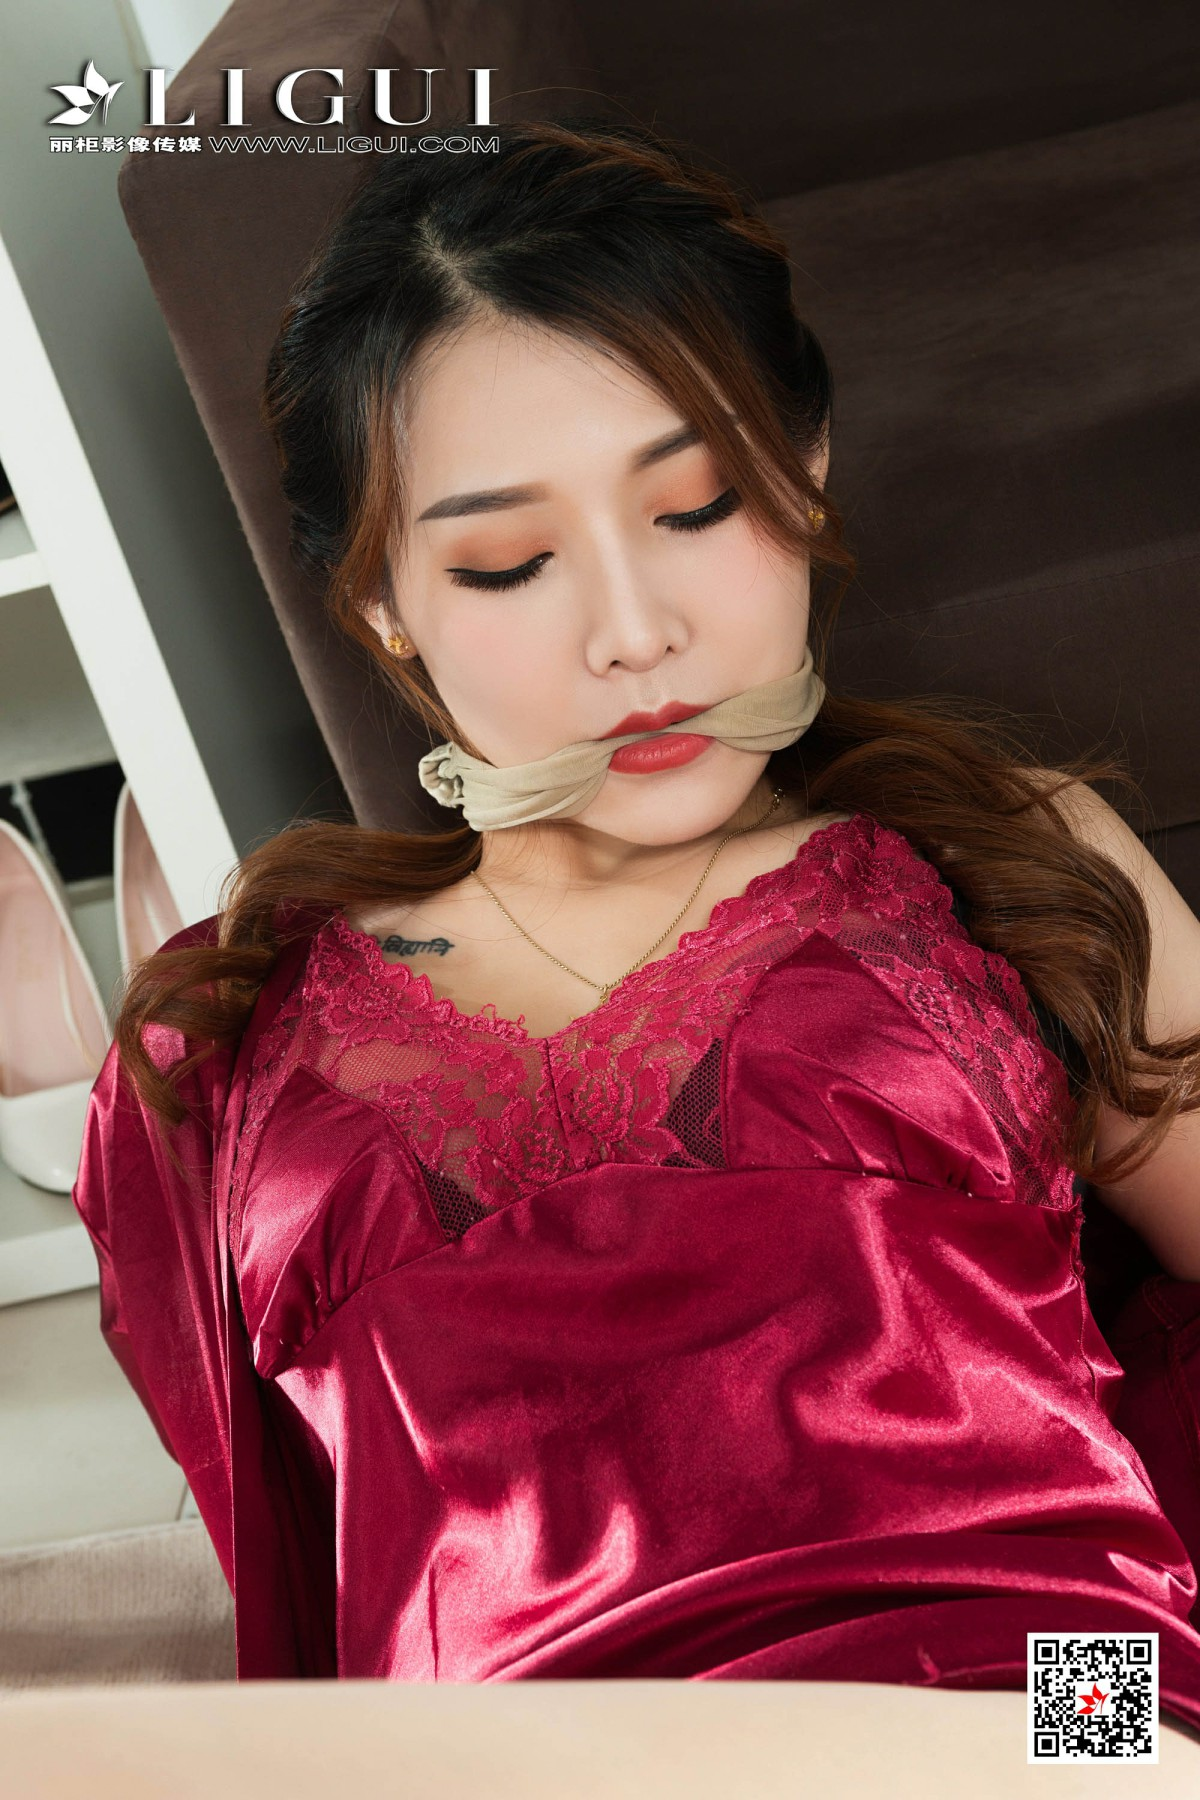 [Ligui丽柜]2020.03.21 网络丽人 Model 文静-第1张图片-福利社